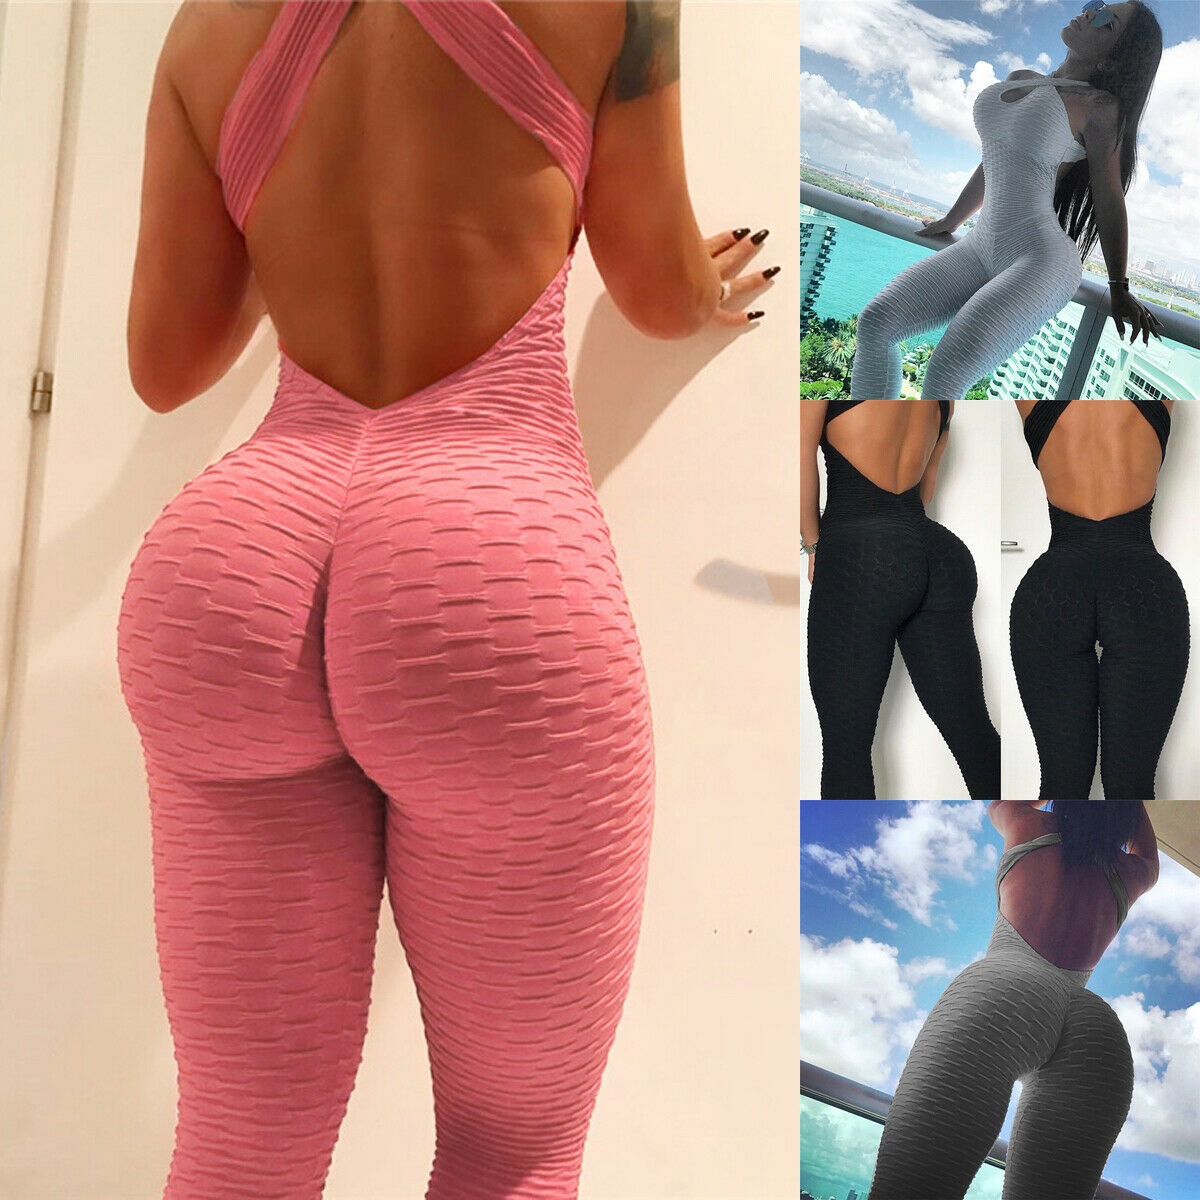 Women Fitness YOGA Leggings Jumpsuit Romper Sports Gym Pants Athletic Clothes s0